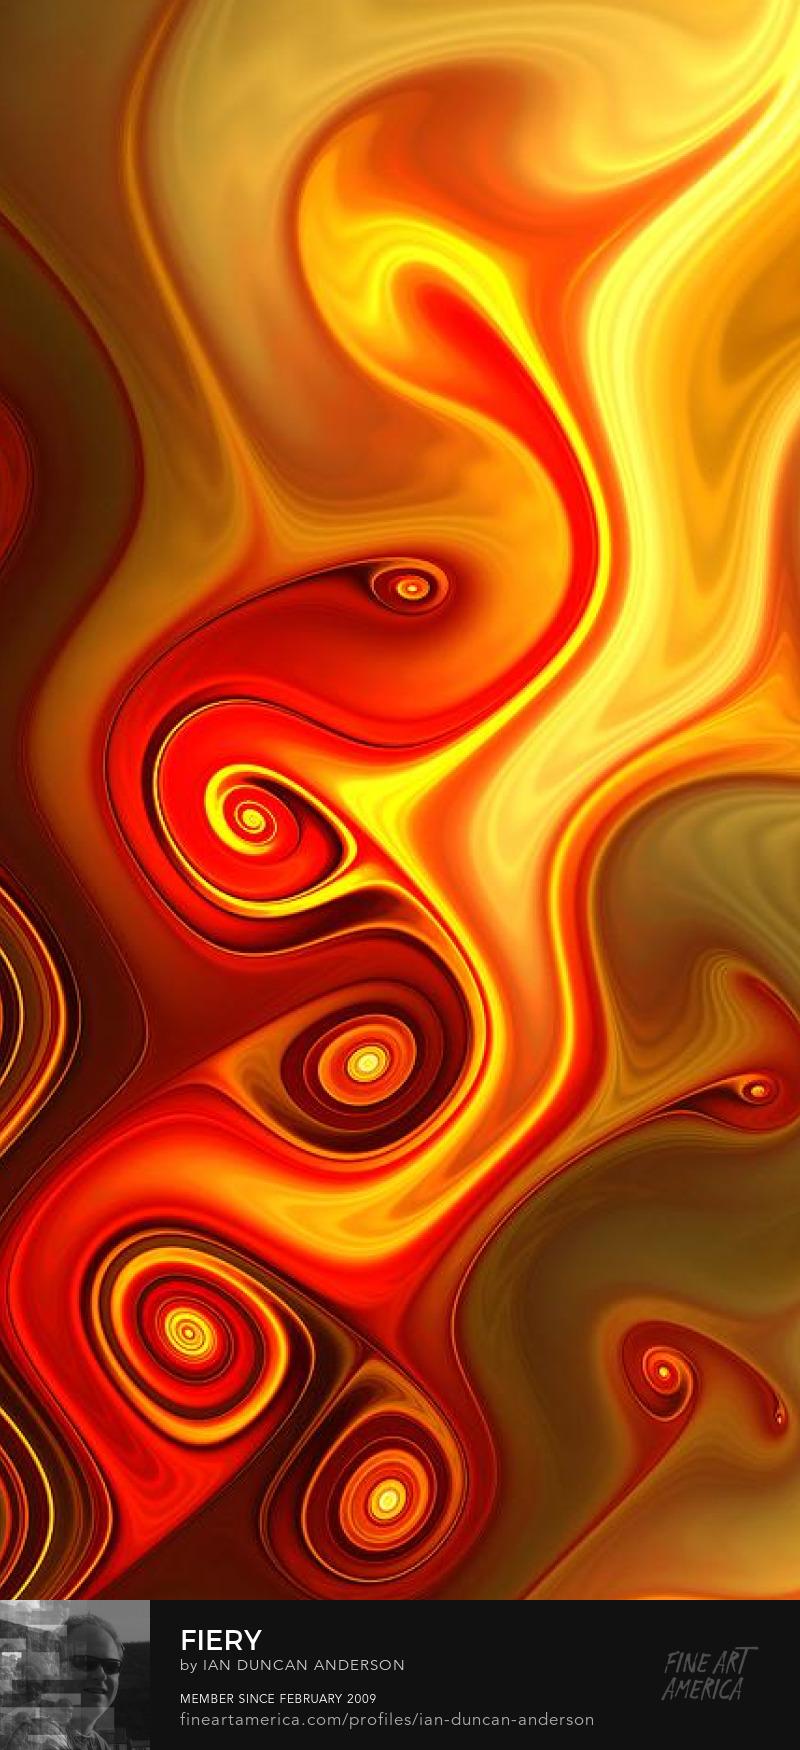 buy print of 'Fiery' at Fine Art America